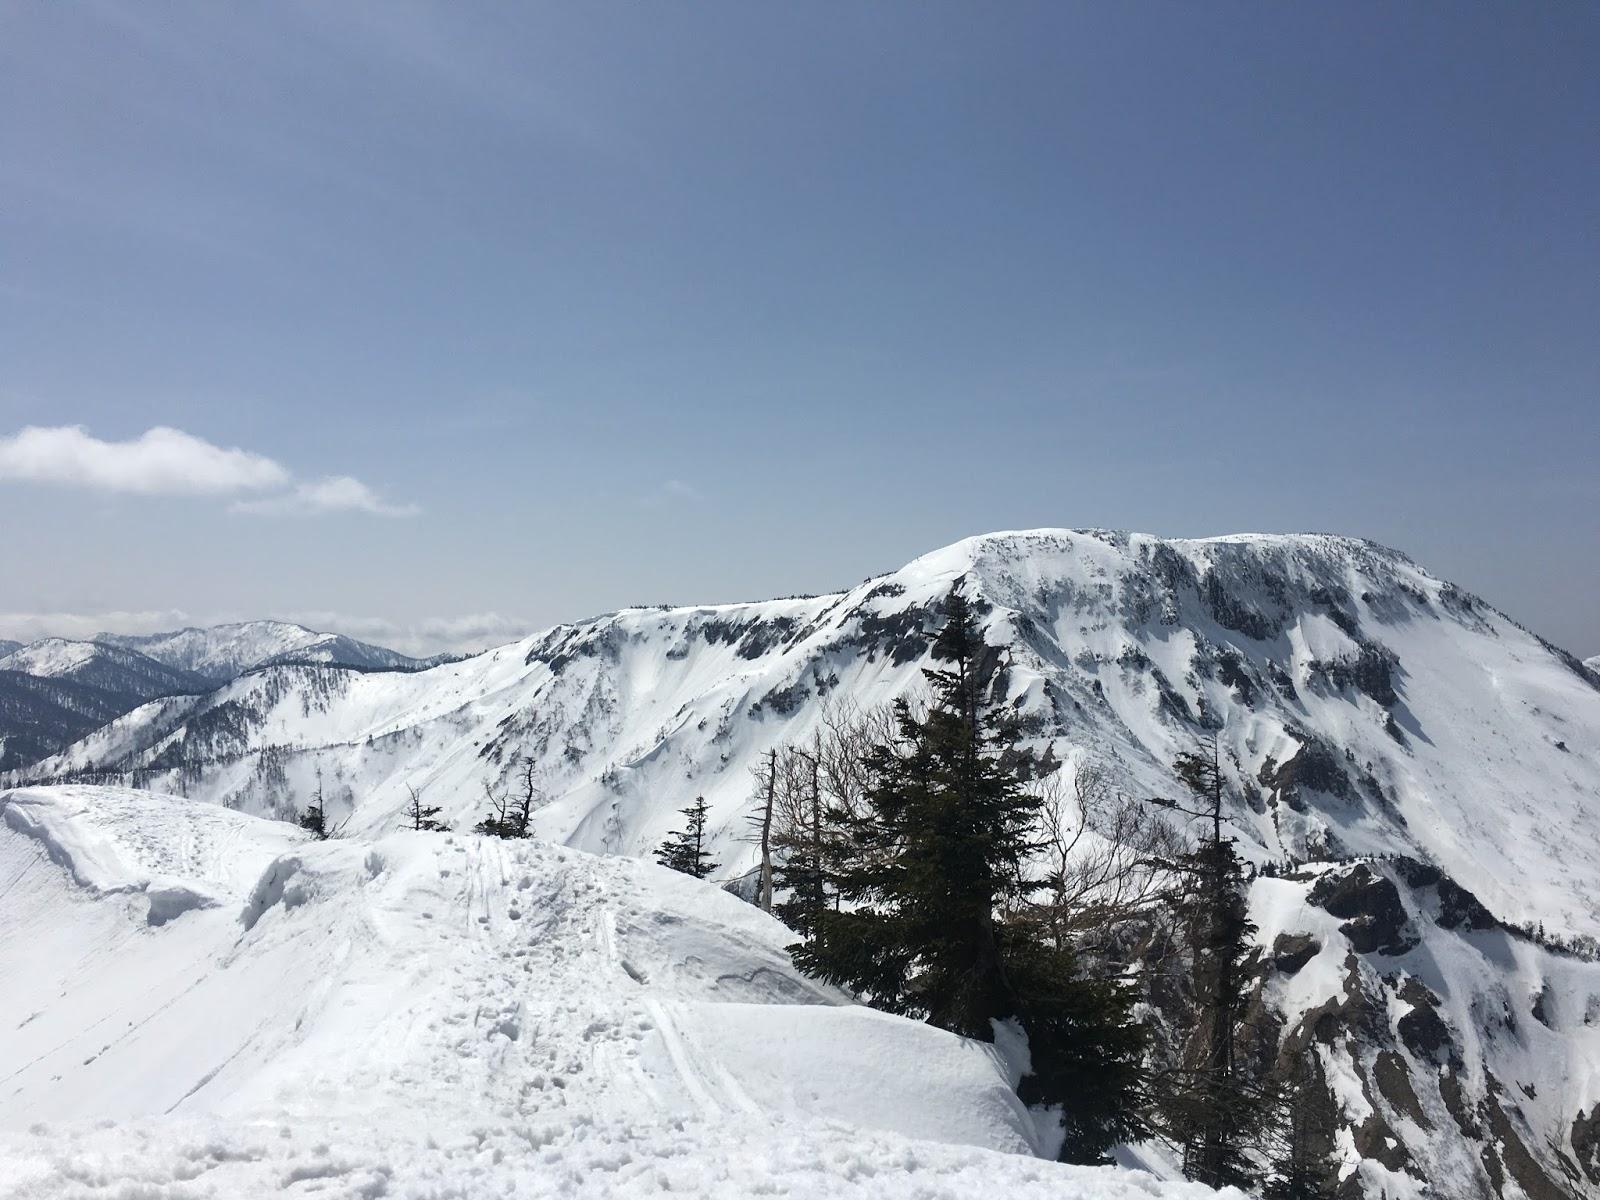 kagura one day snow hiking | first track - where we go